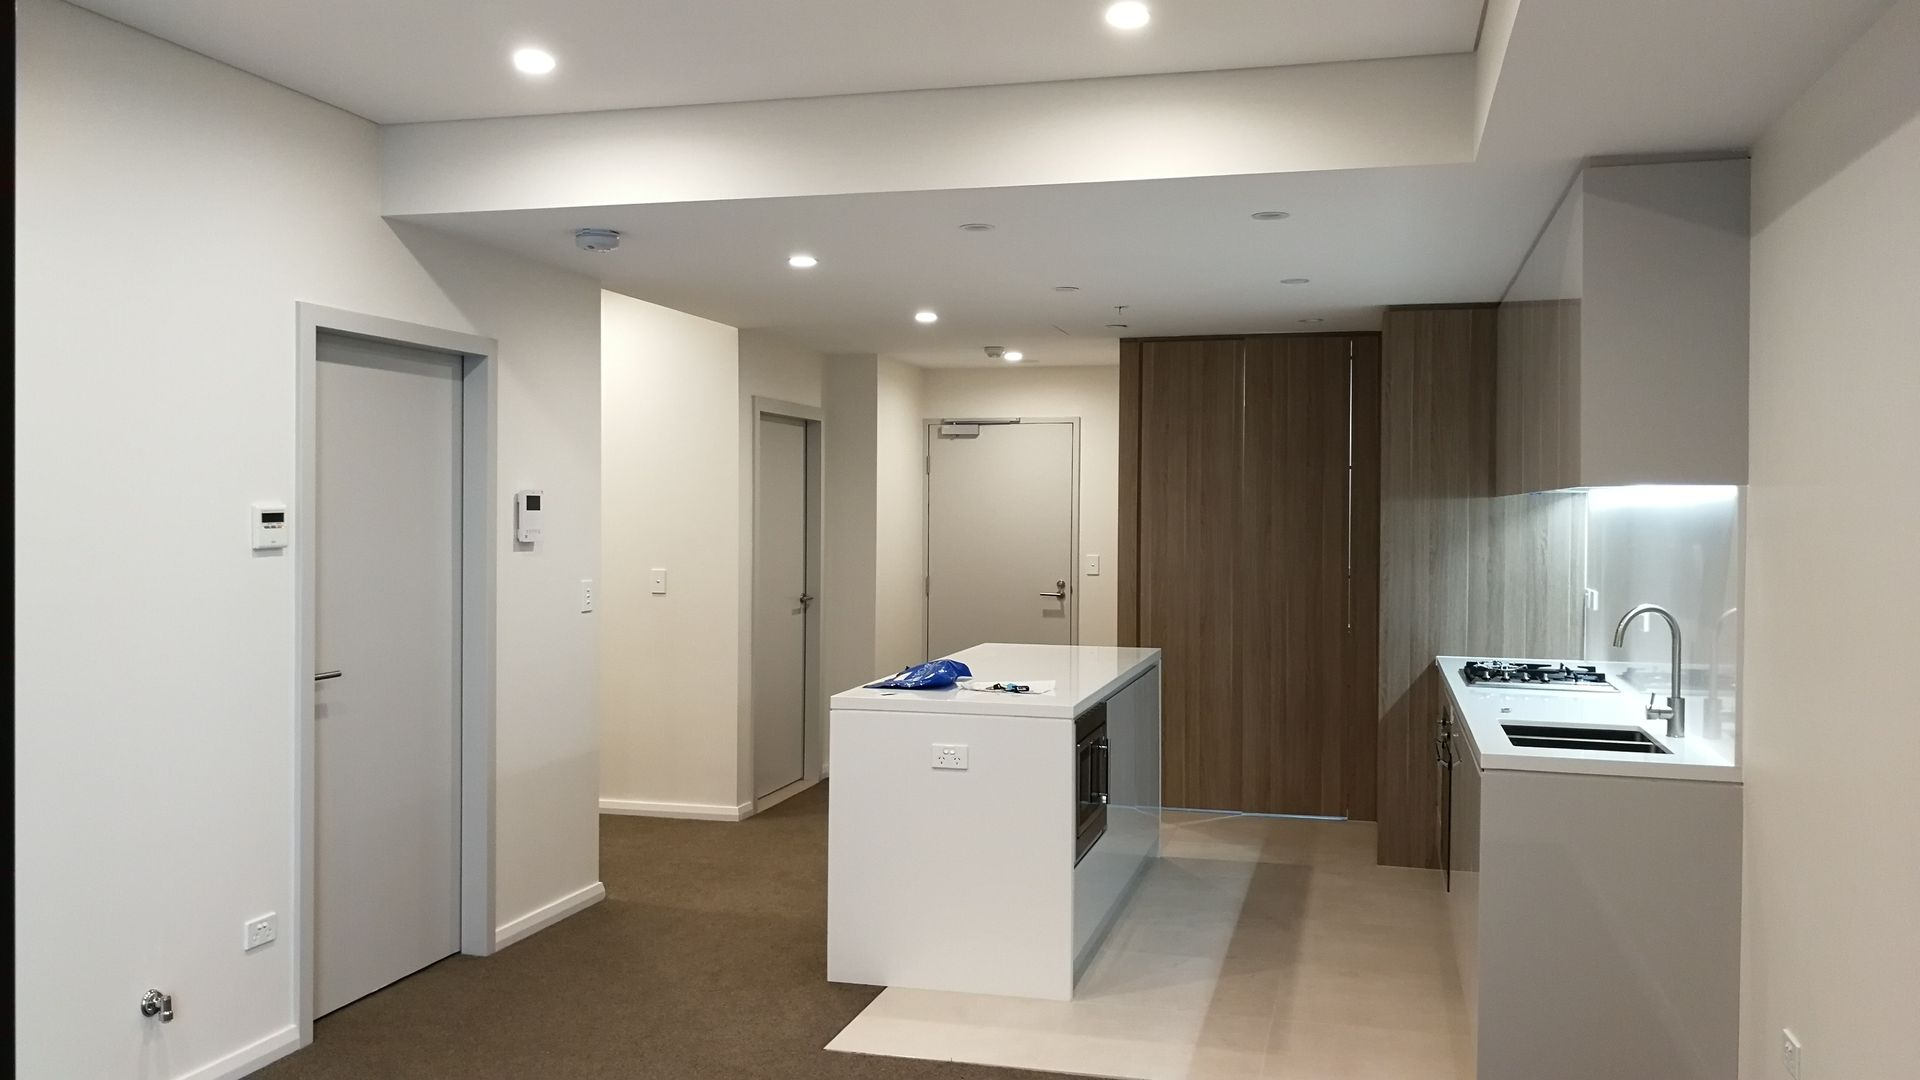 Level 3/20 Woniora Road, Hurstville NSW 2220, Image 2